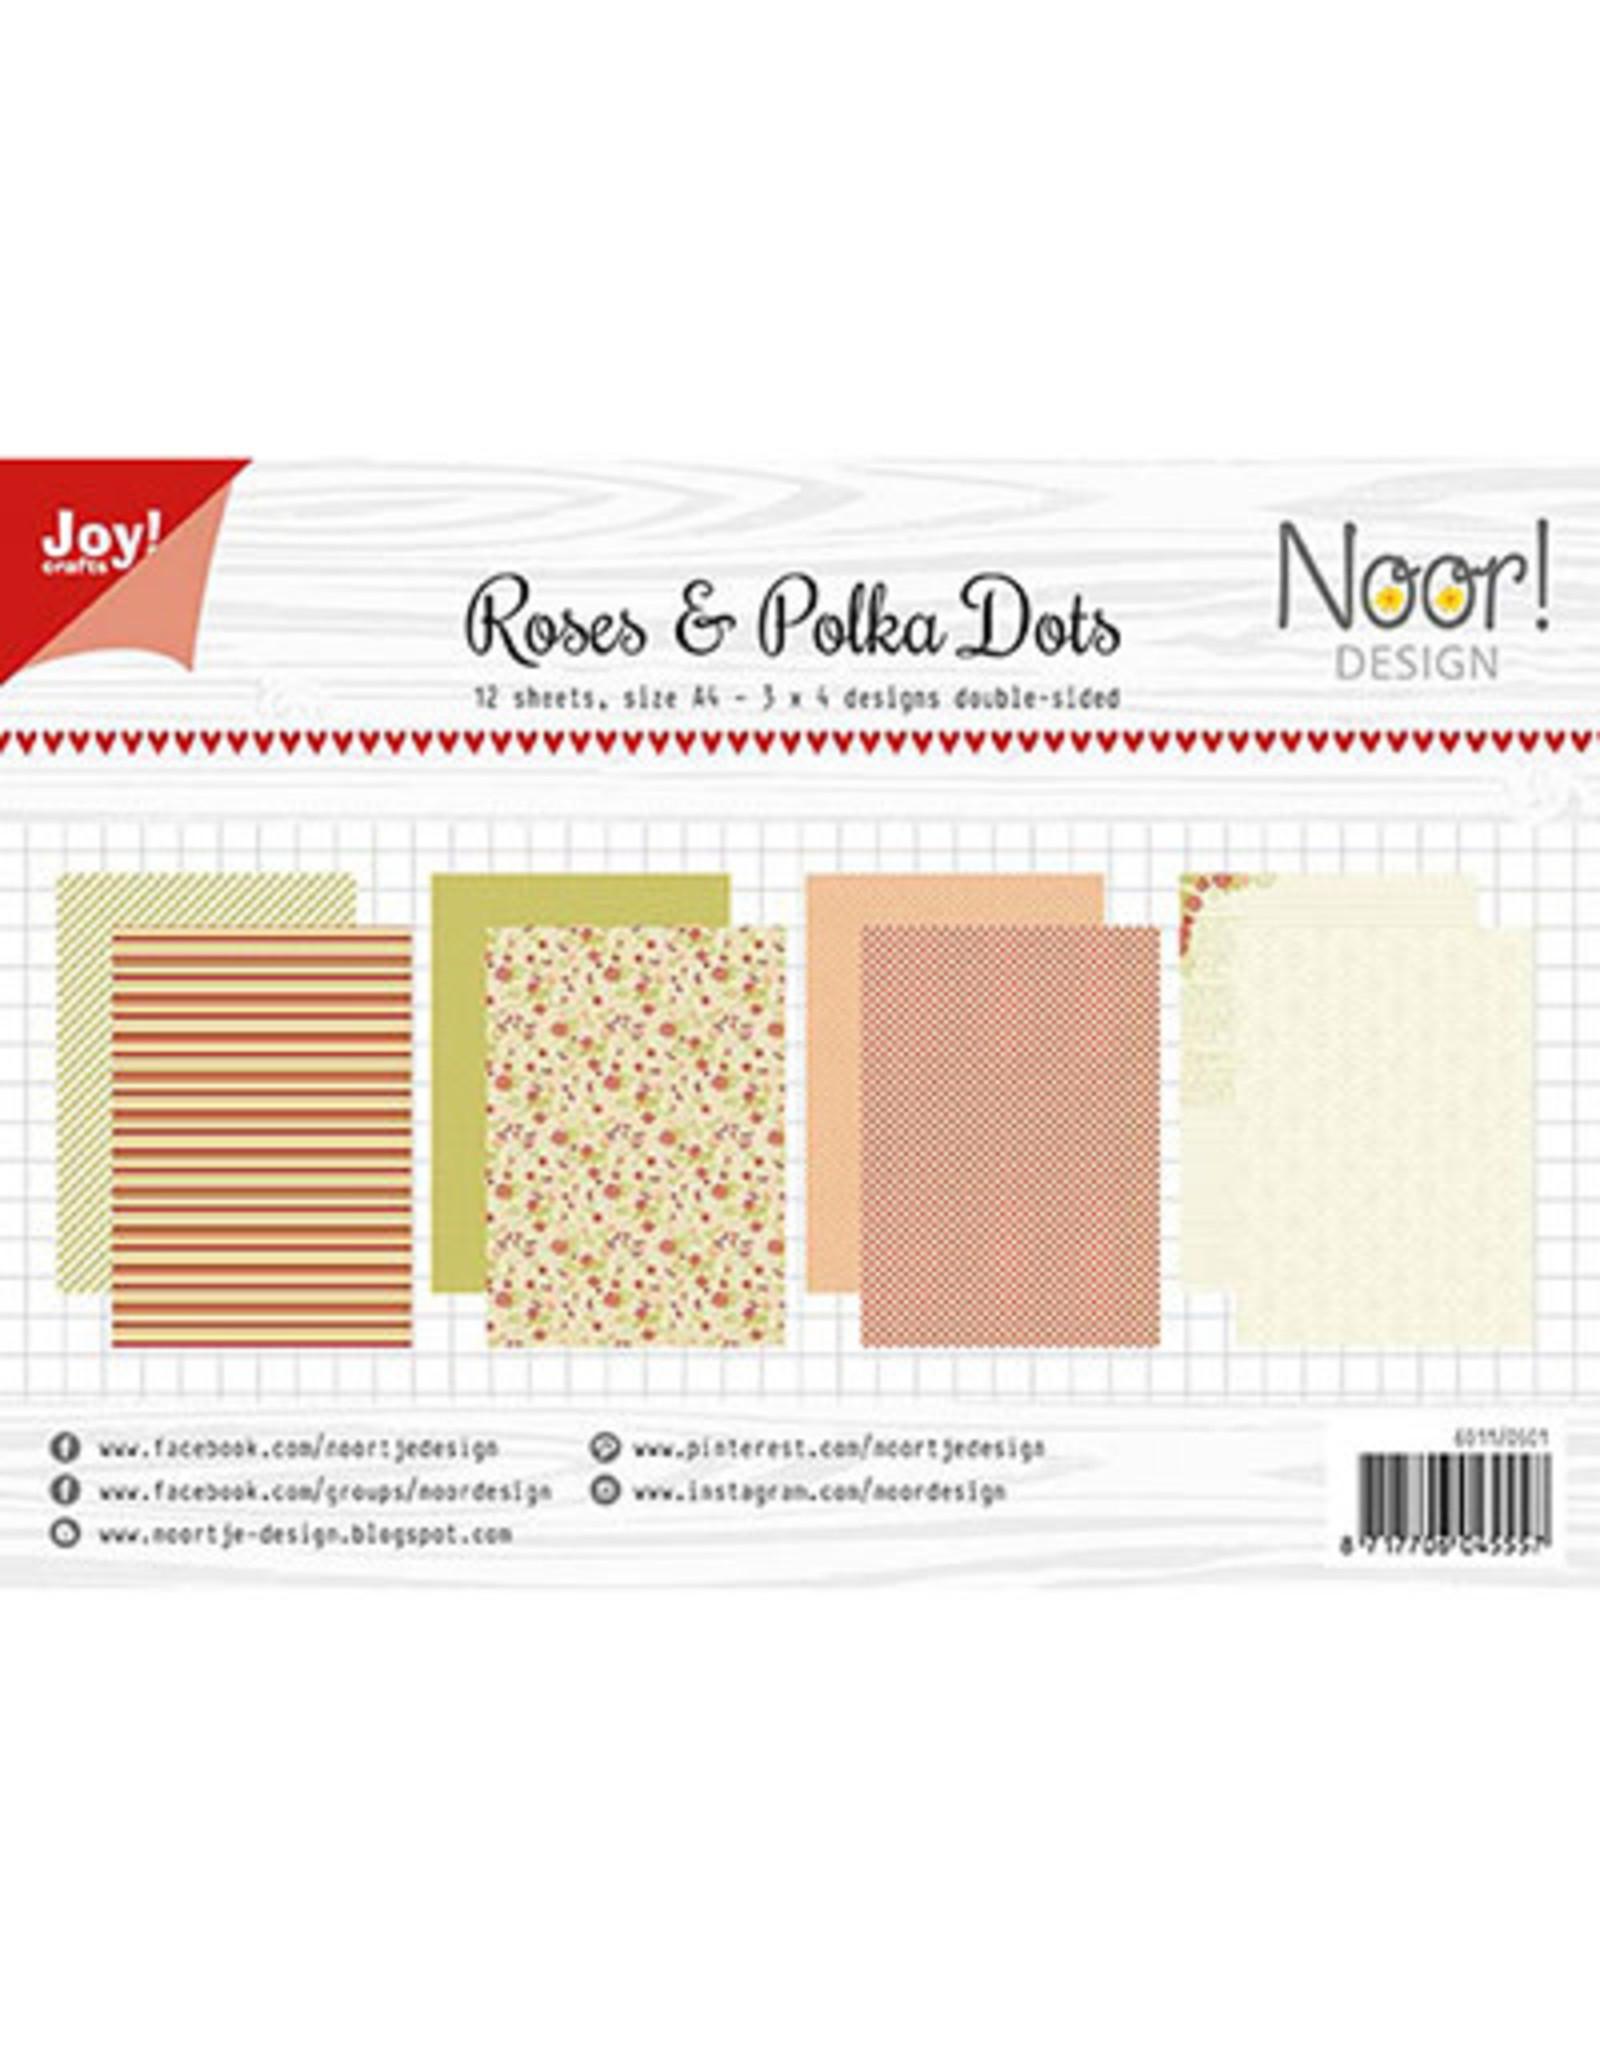 Joy Craft Joy Craft Papier Set A4 Design Roses & Polkadots  6011/0601